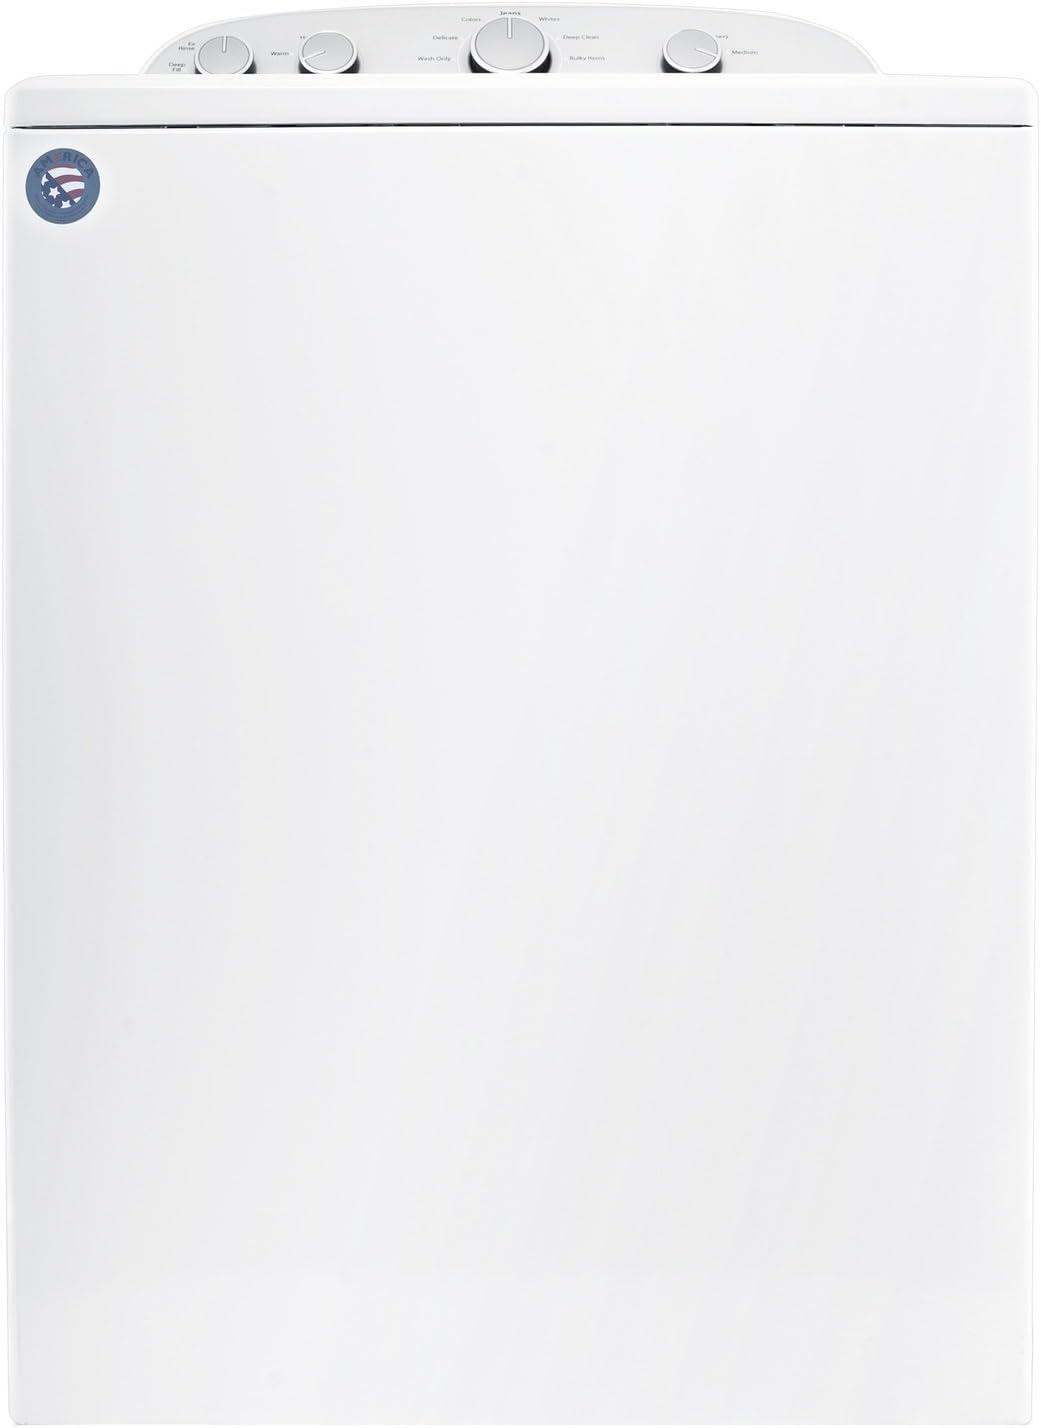 Whirlpool profesional carga superior 15kg gewerbe lavadora Blanco